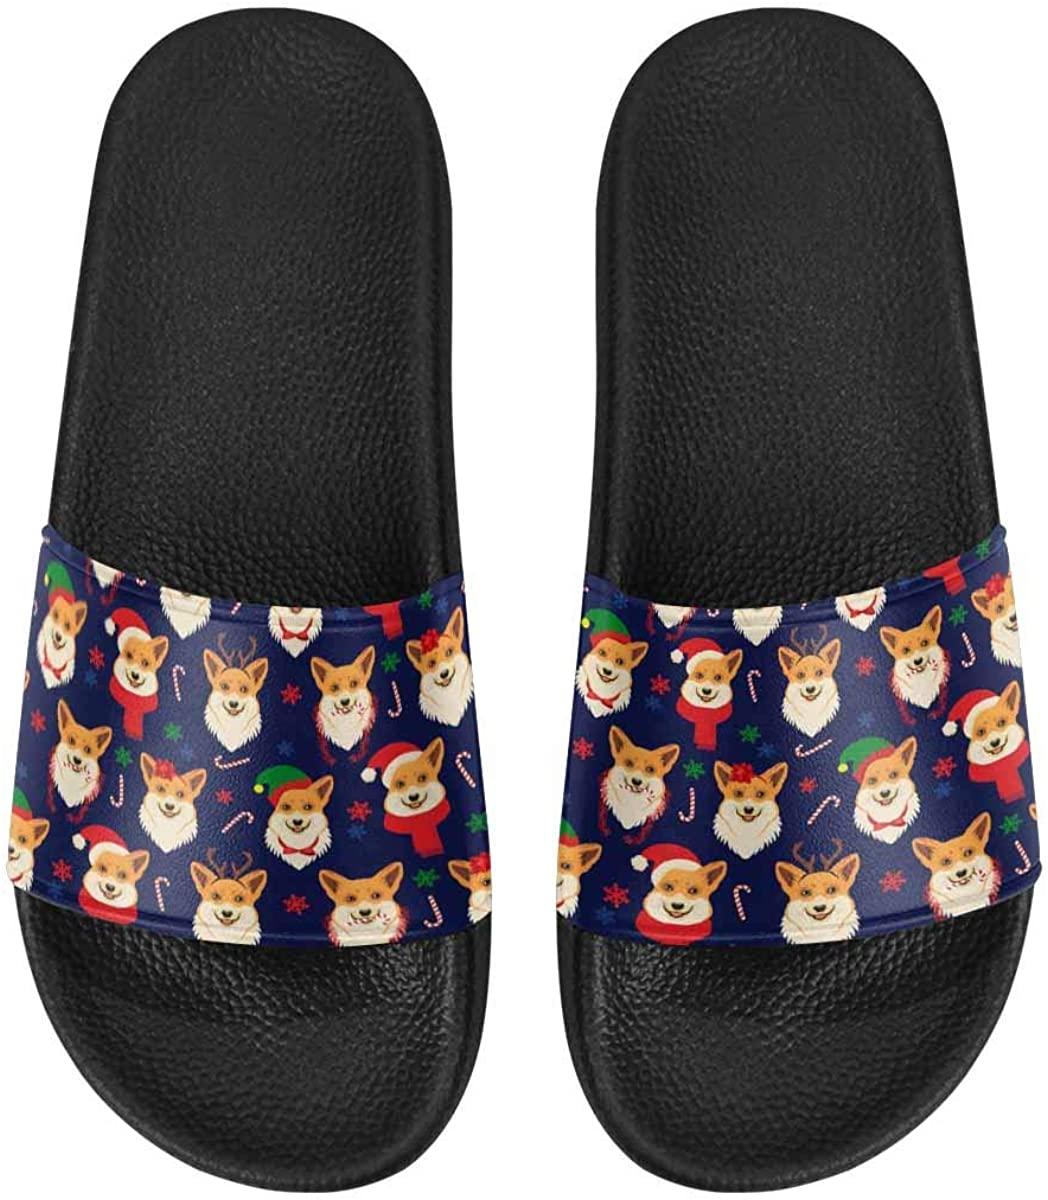 INTERESTPRINT Christmas Corgis Men Slide Sandals Lightweight Breathable Sandals Shoes